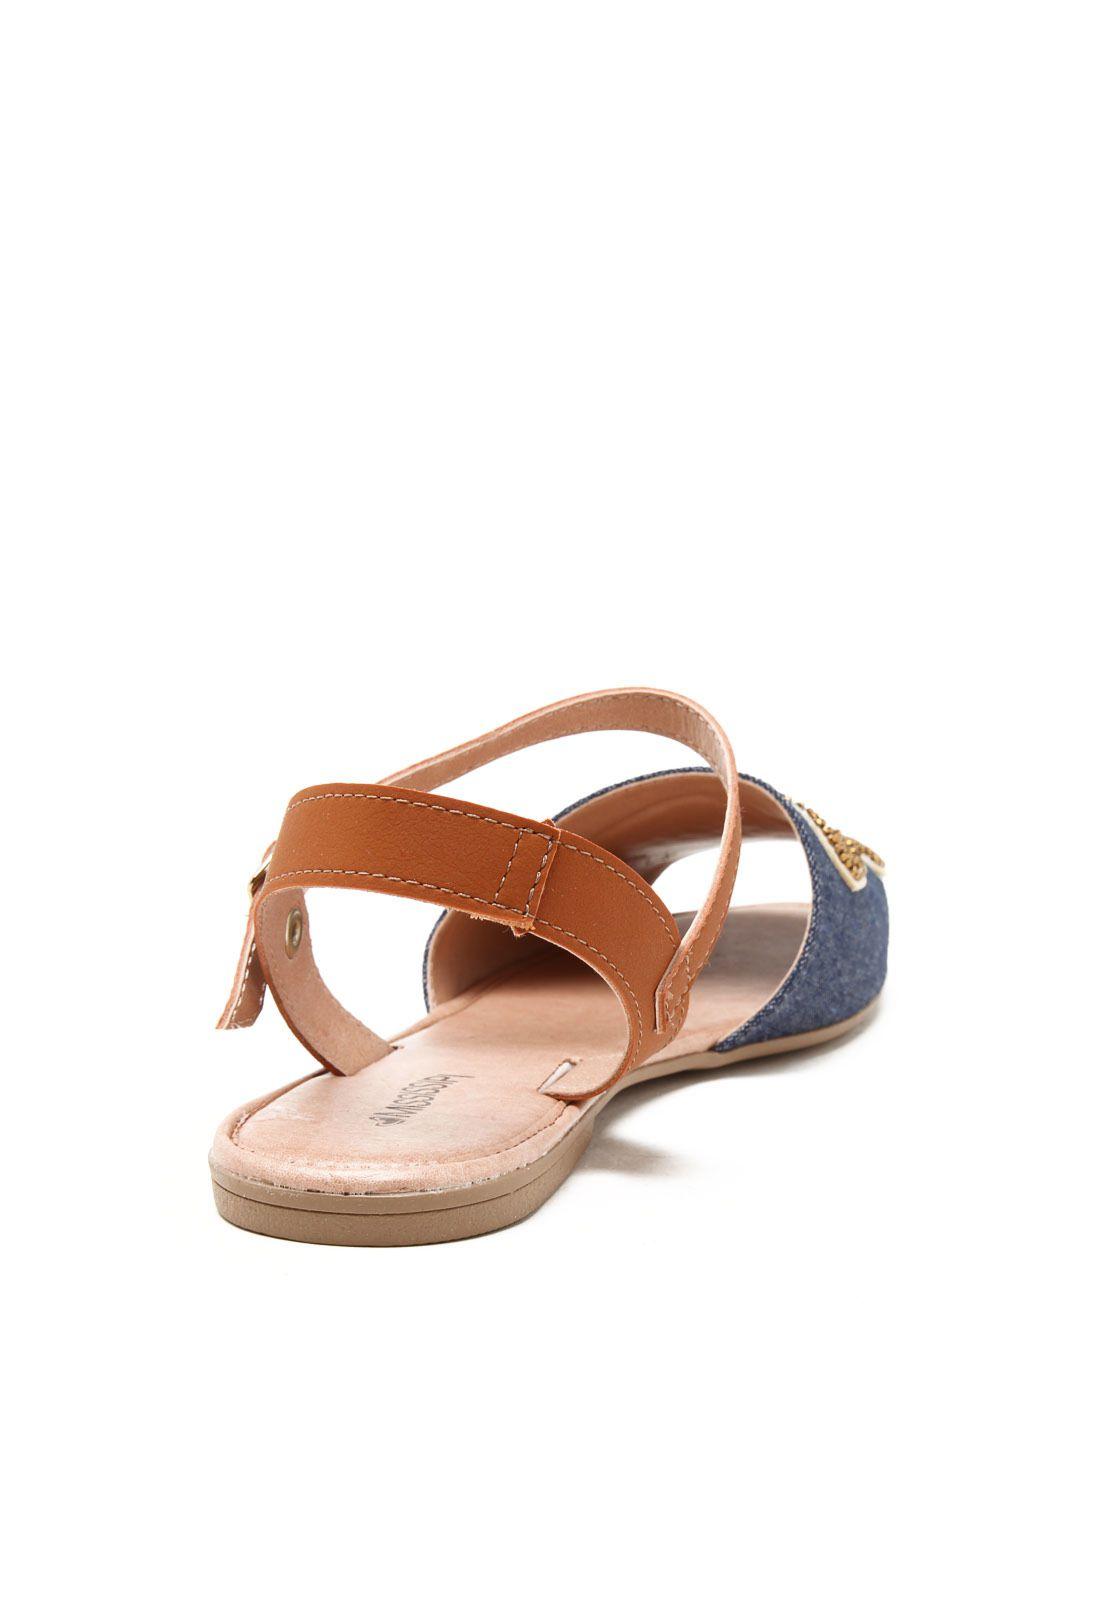 Sandalia Rasteira Mississipi X7691 - Jeans